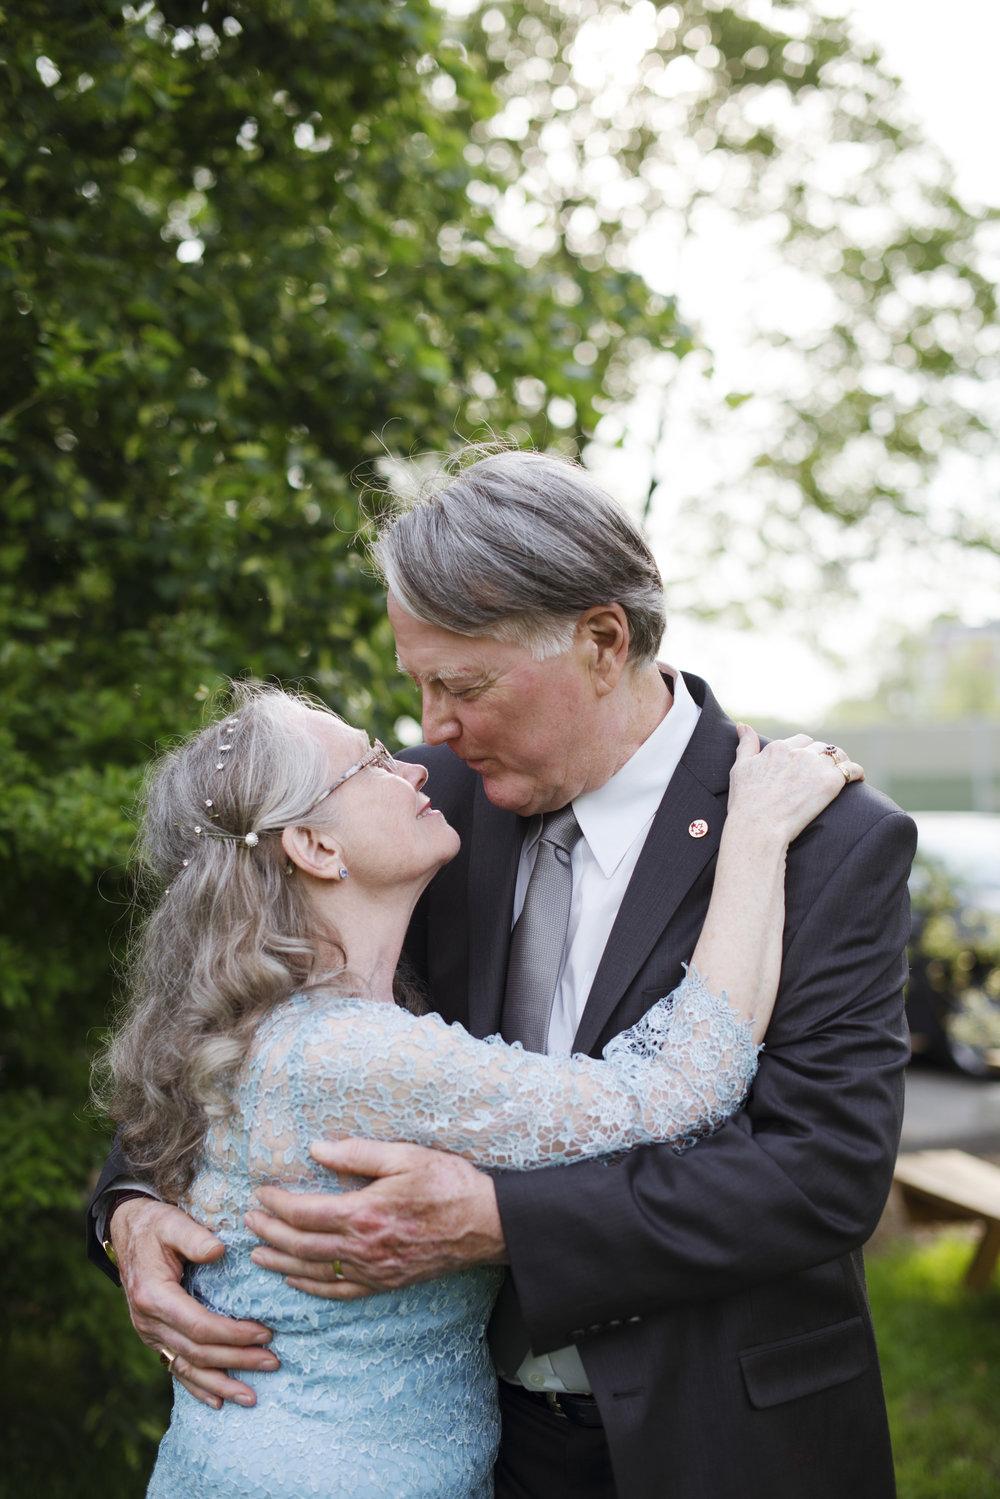 RosewoodWeddingPhotos-KathyMichael-OlderCouple-PortCredit-SummerWedding-SecondWedding-Elder-Grandparents-SecondLove